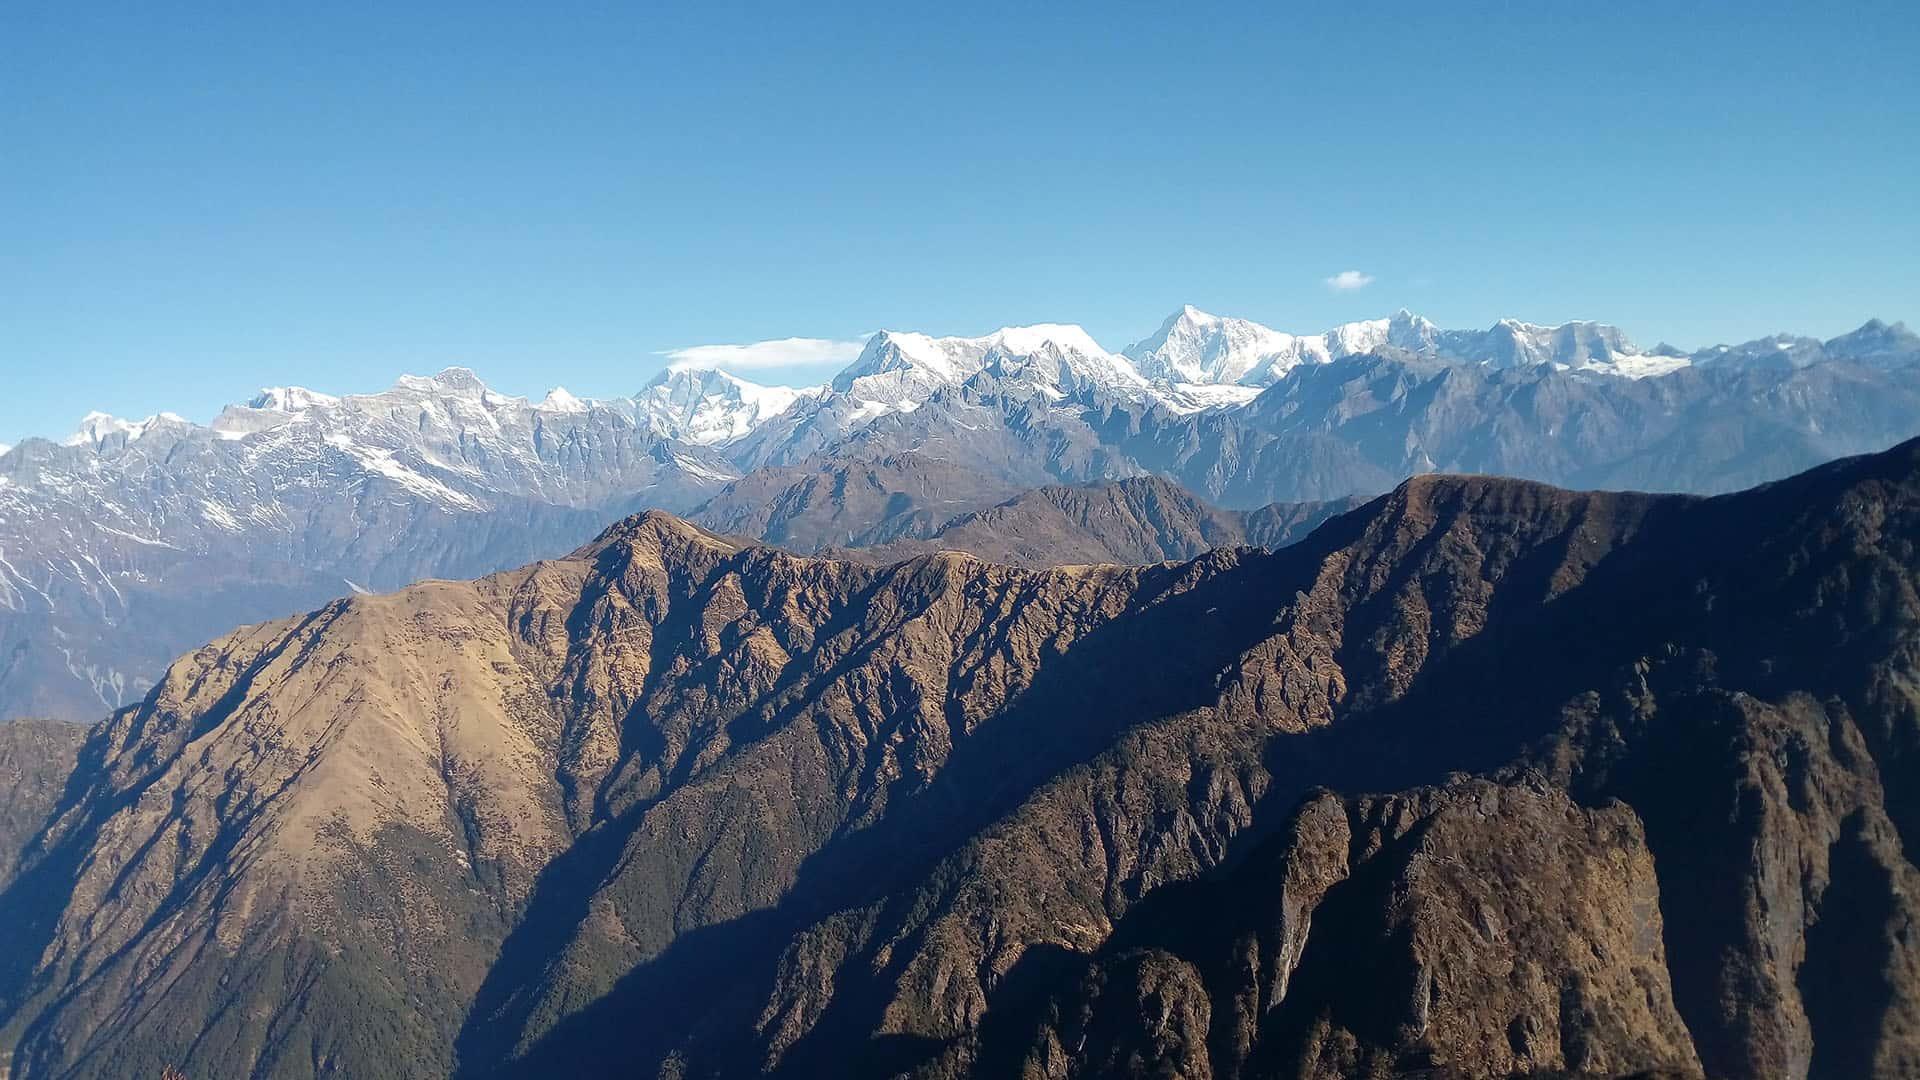 Arun Valley & Solukhumbu